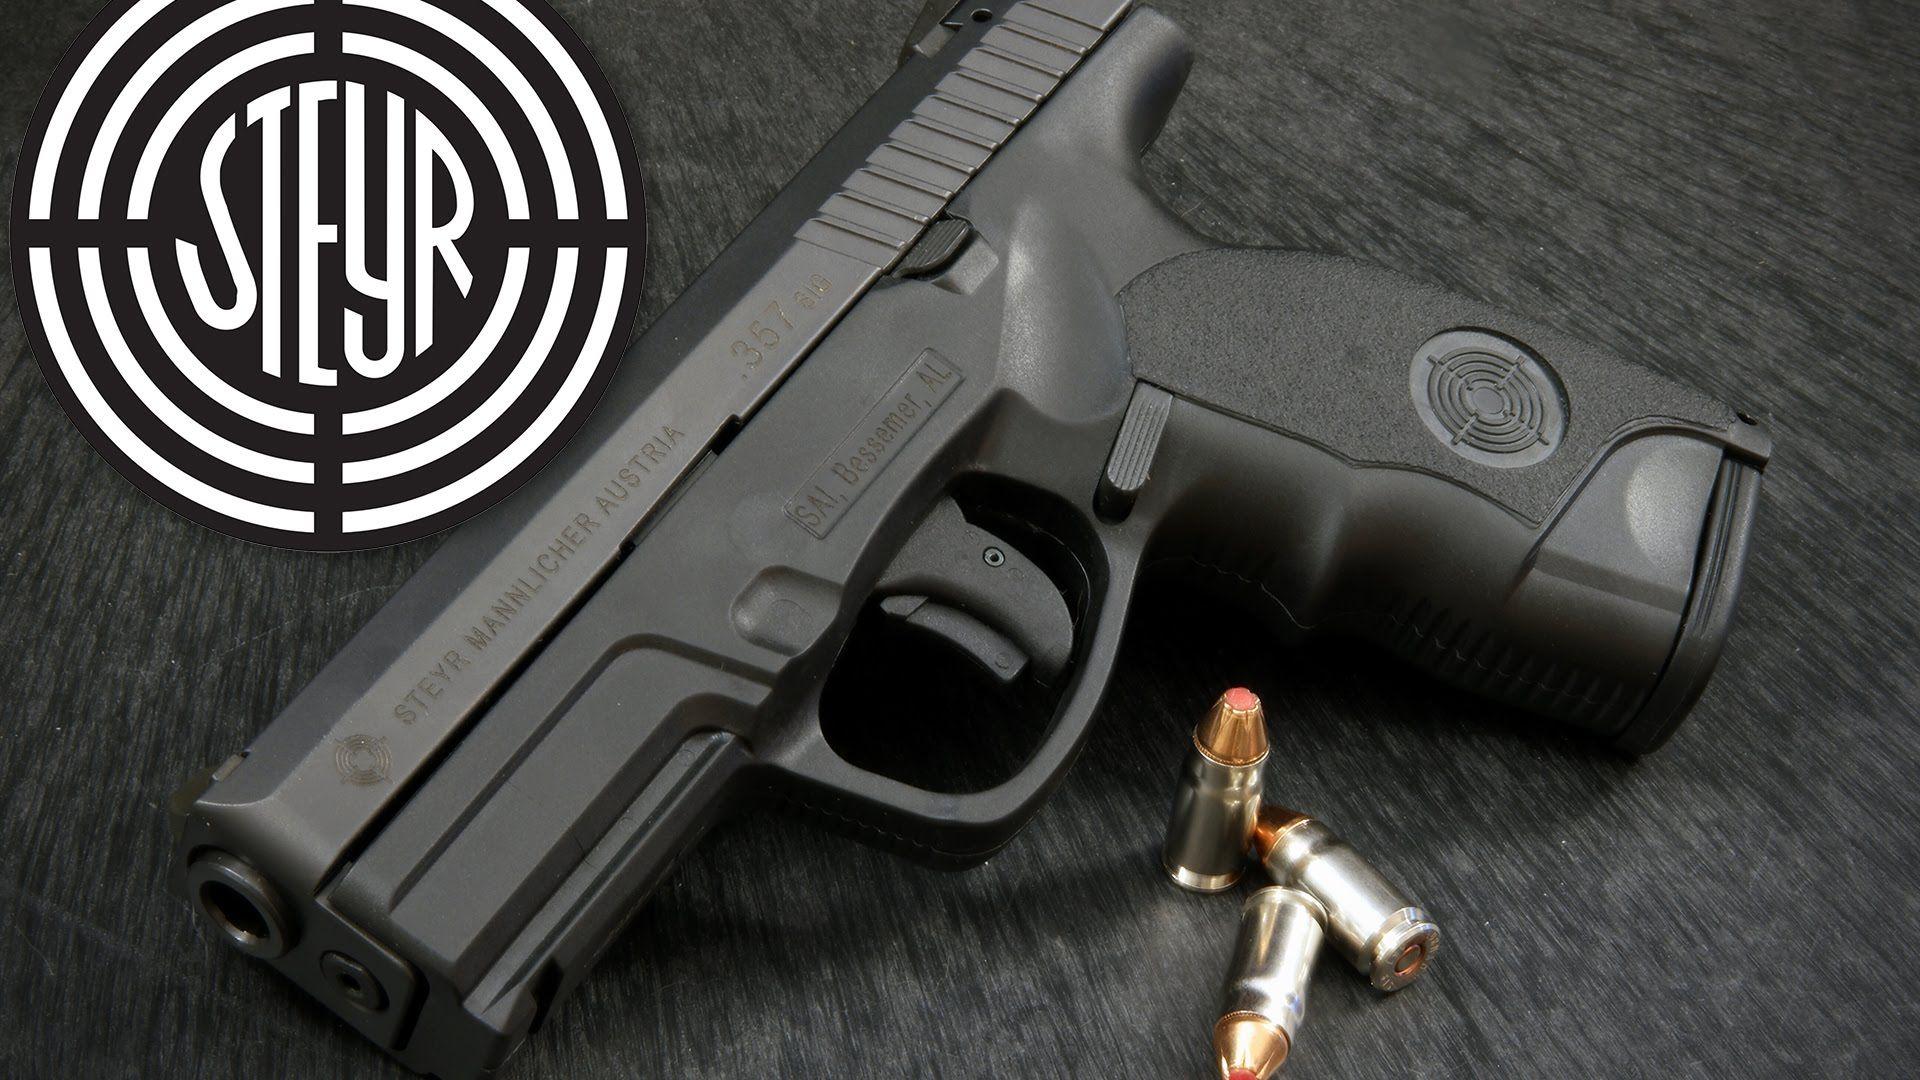 Pin by RAE Industries on steyr m pistols | Steyr, Hand guns